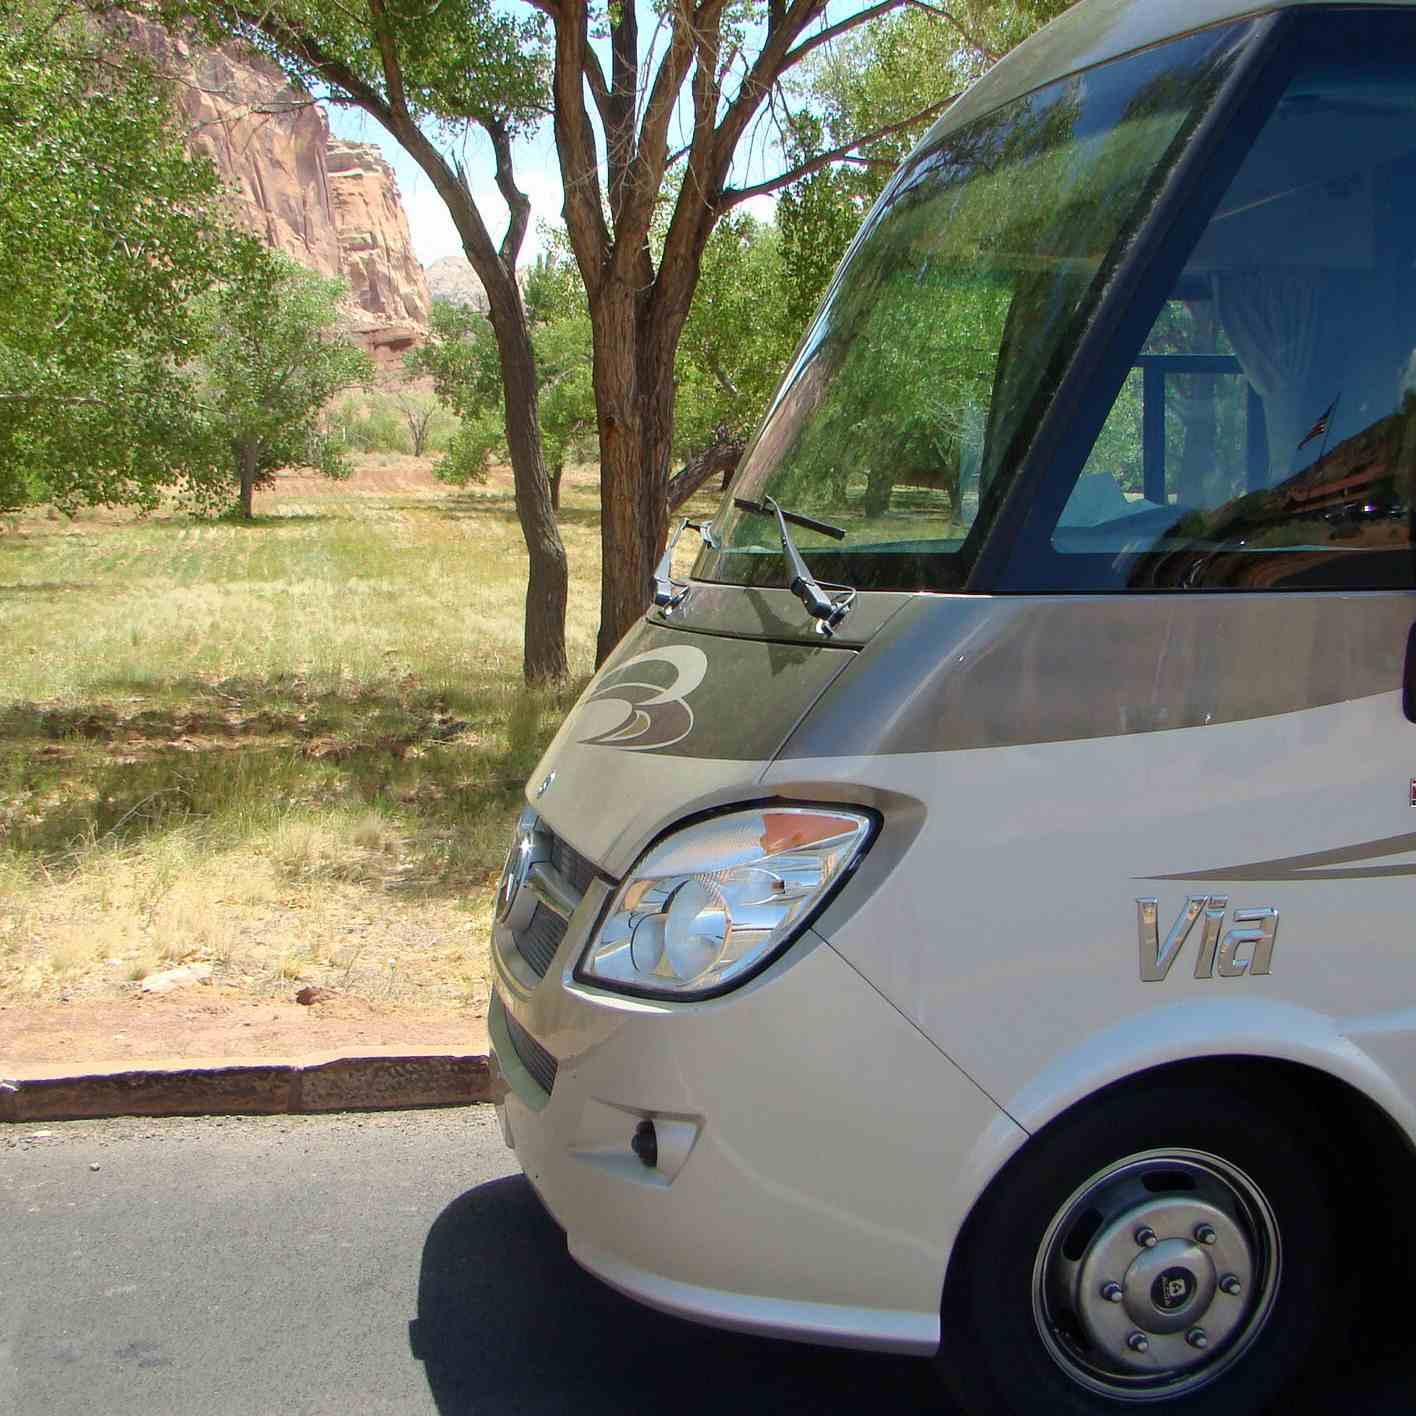 Motorhome Test Drive Review of the Winnebago Via 25Q